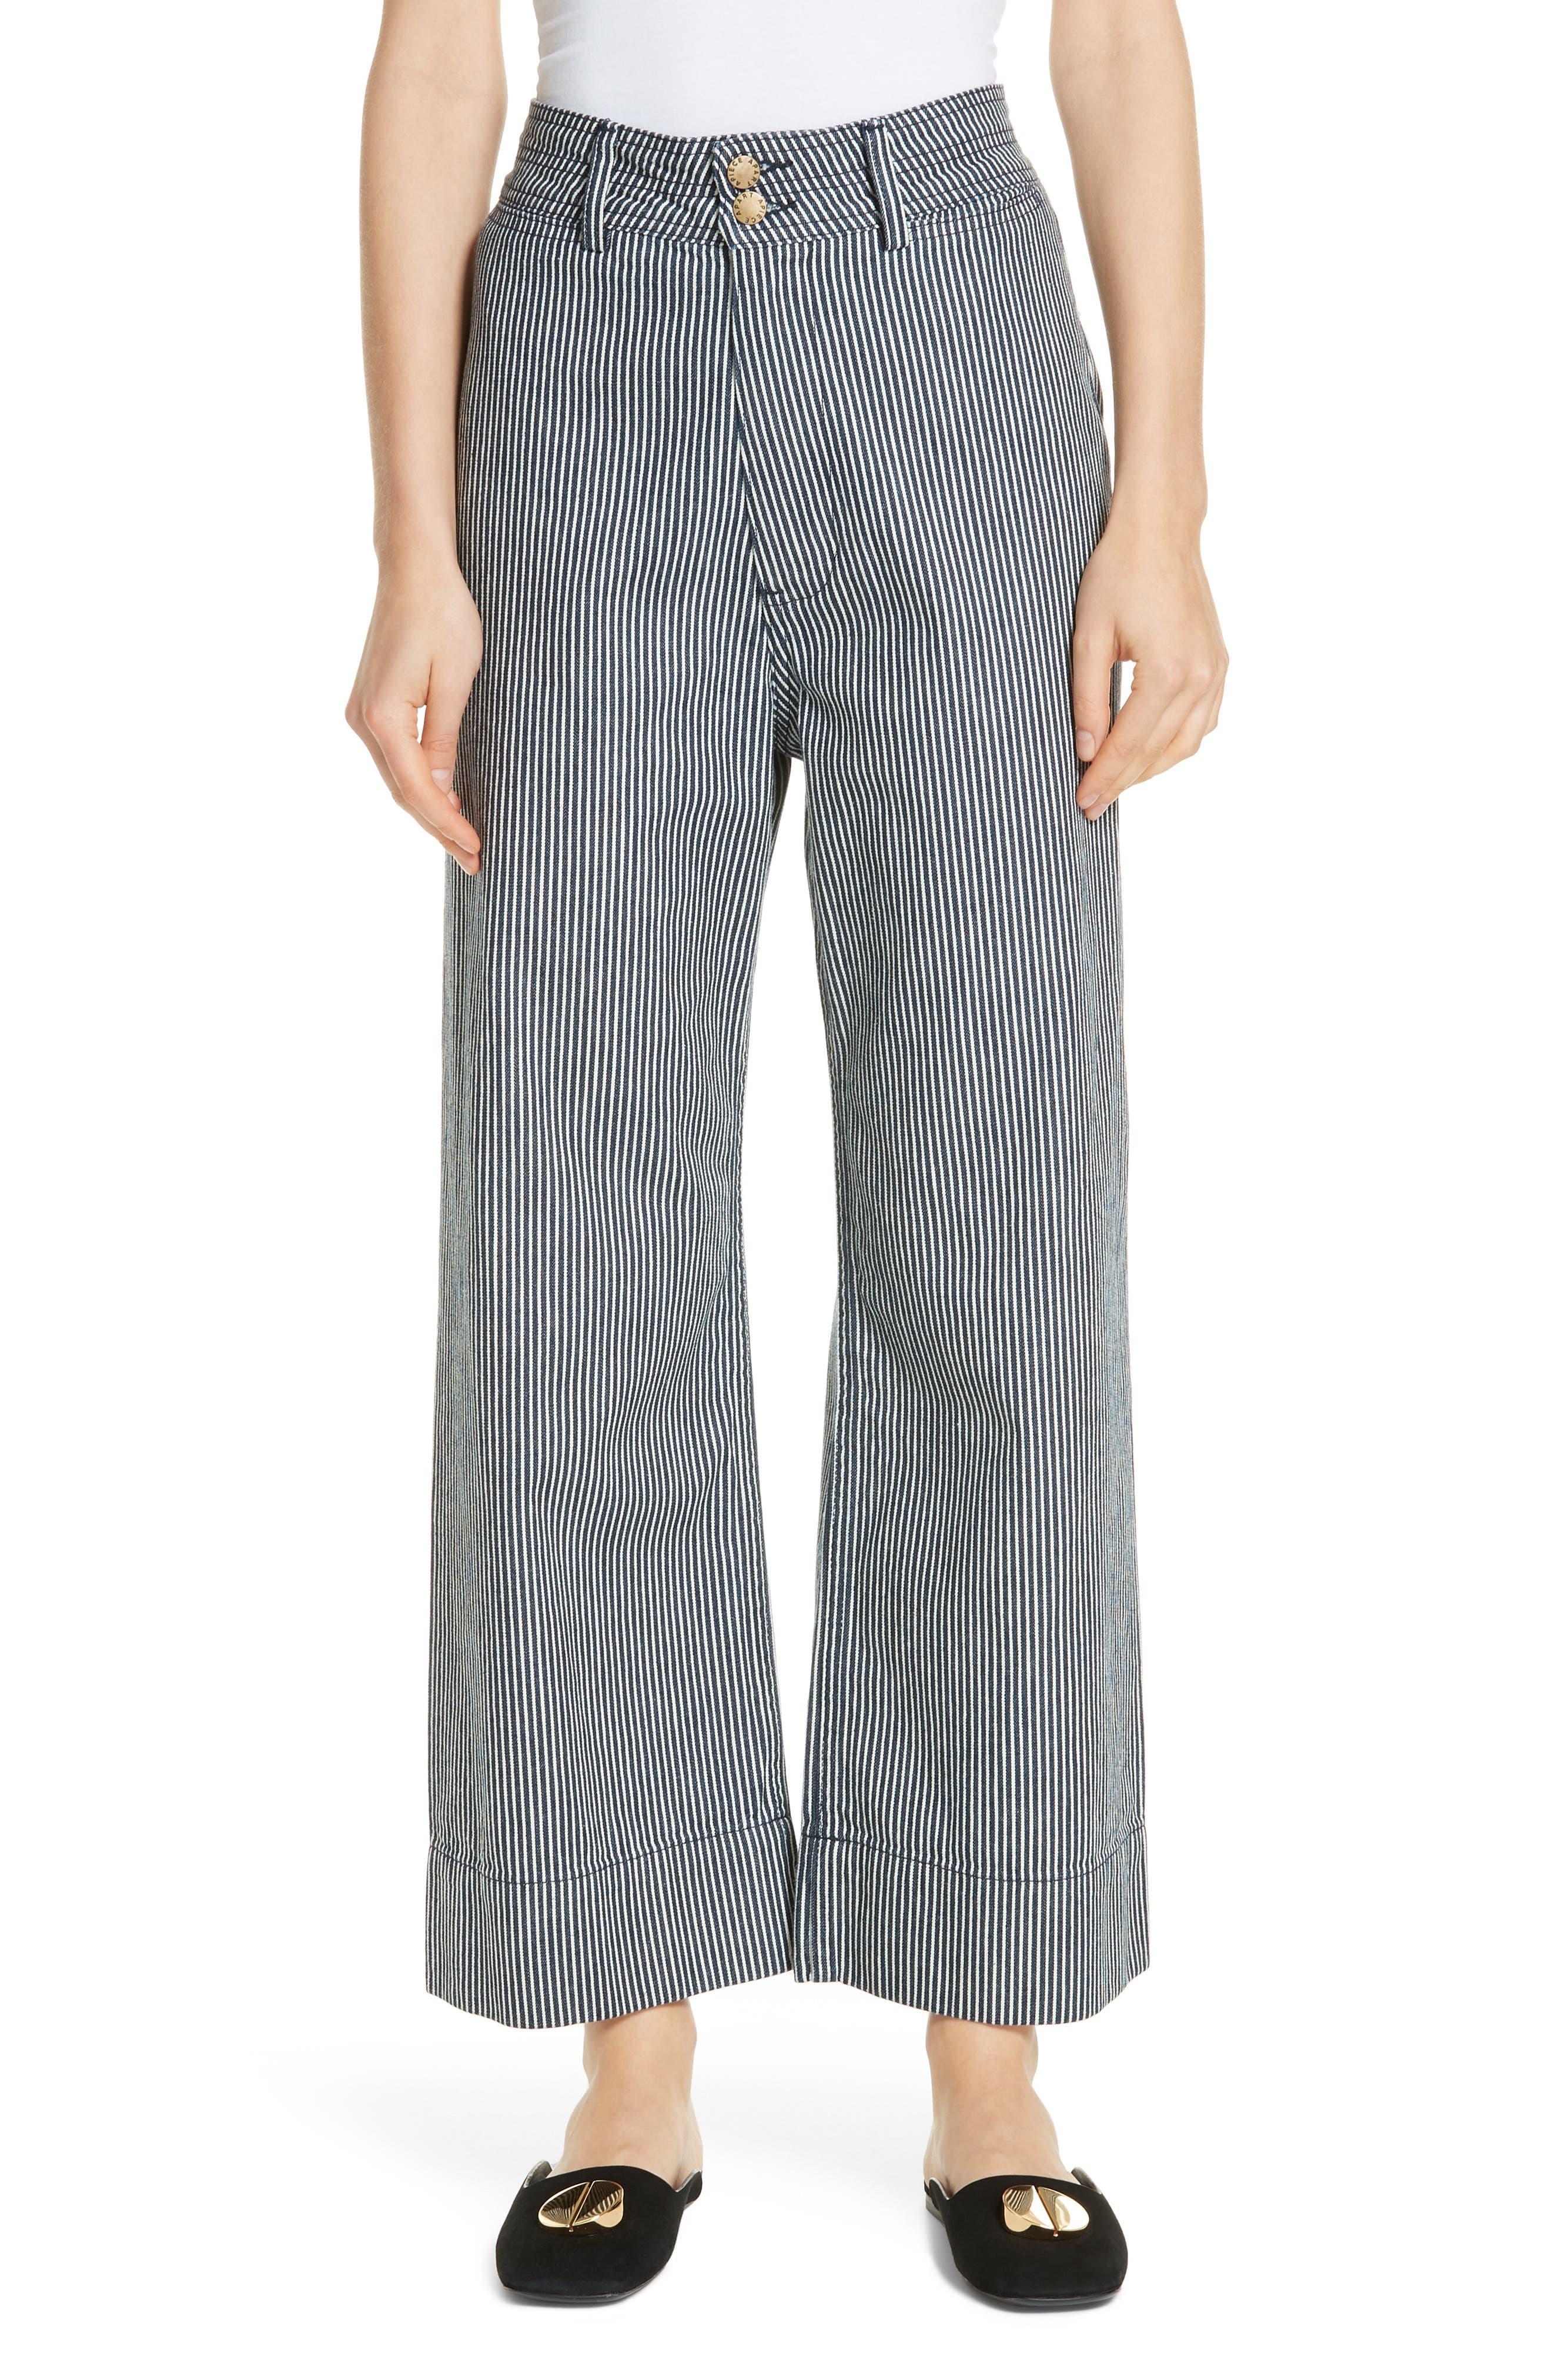 Merida Stripe Denim Wide Leg Pants by Apiece Apart